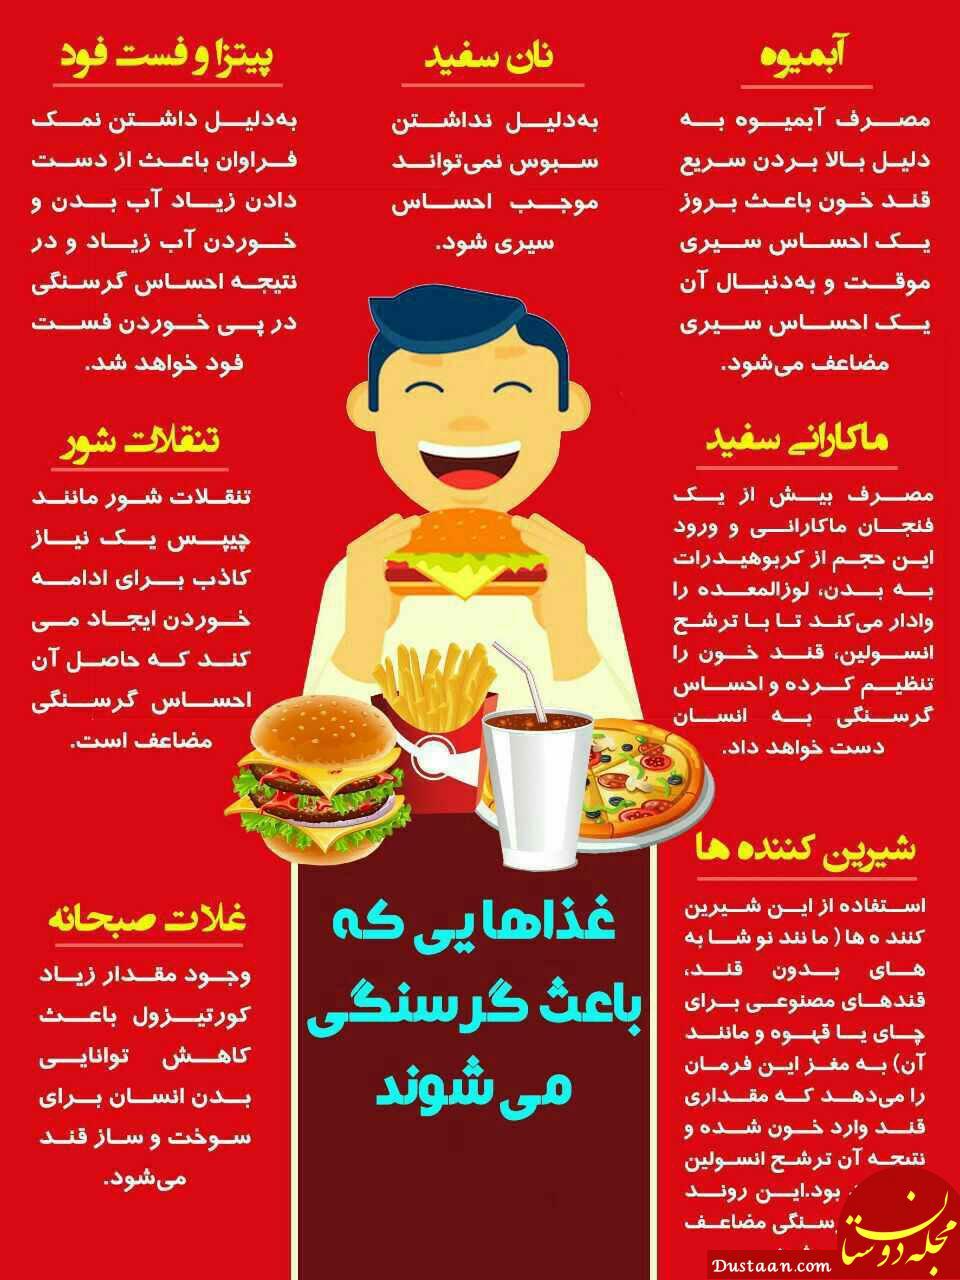 www.dustaan.com غذاهایی که باعث گرسنگی و افزایش وزن مضاعف می شوند!